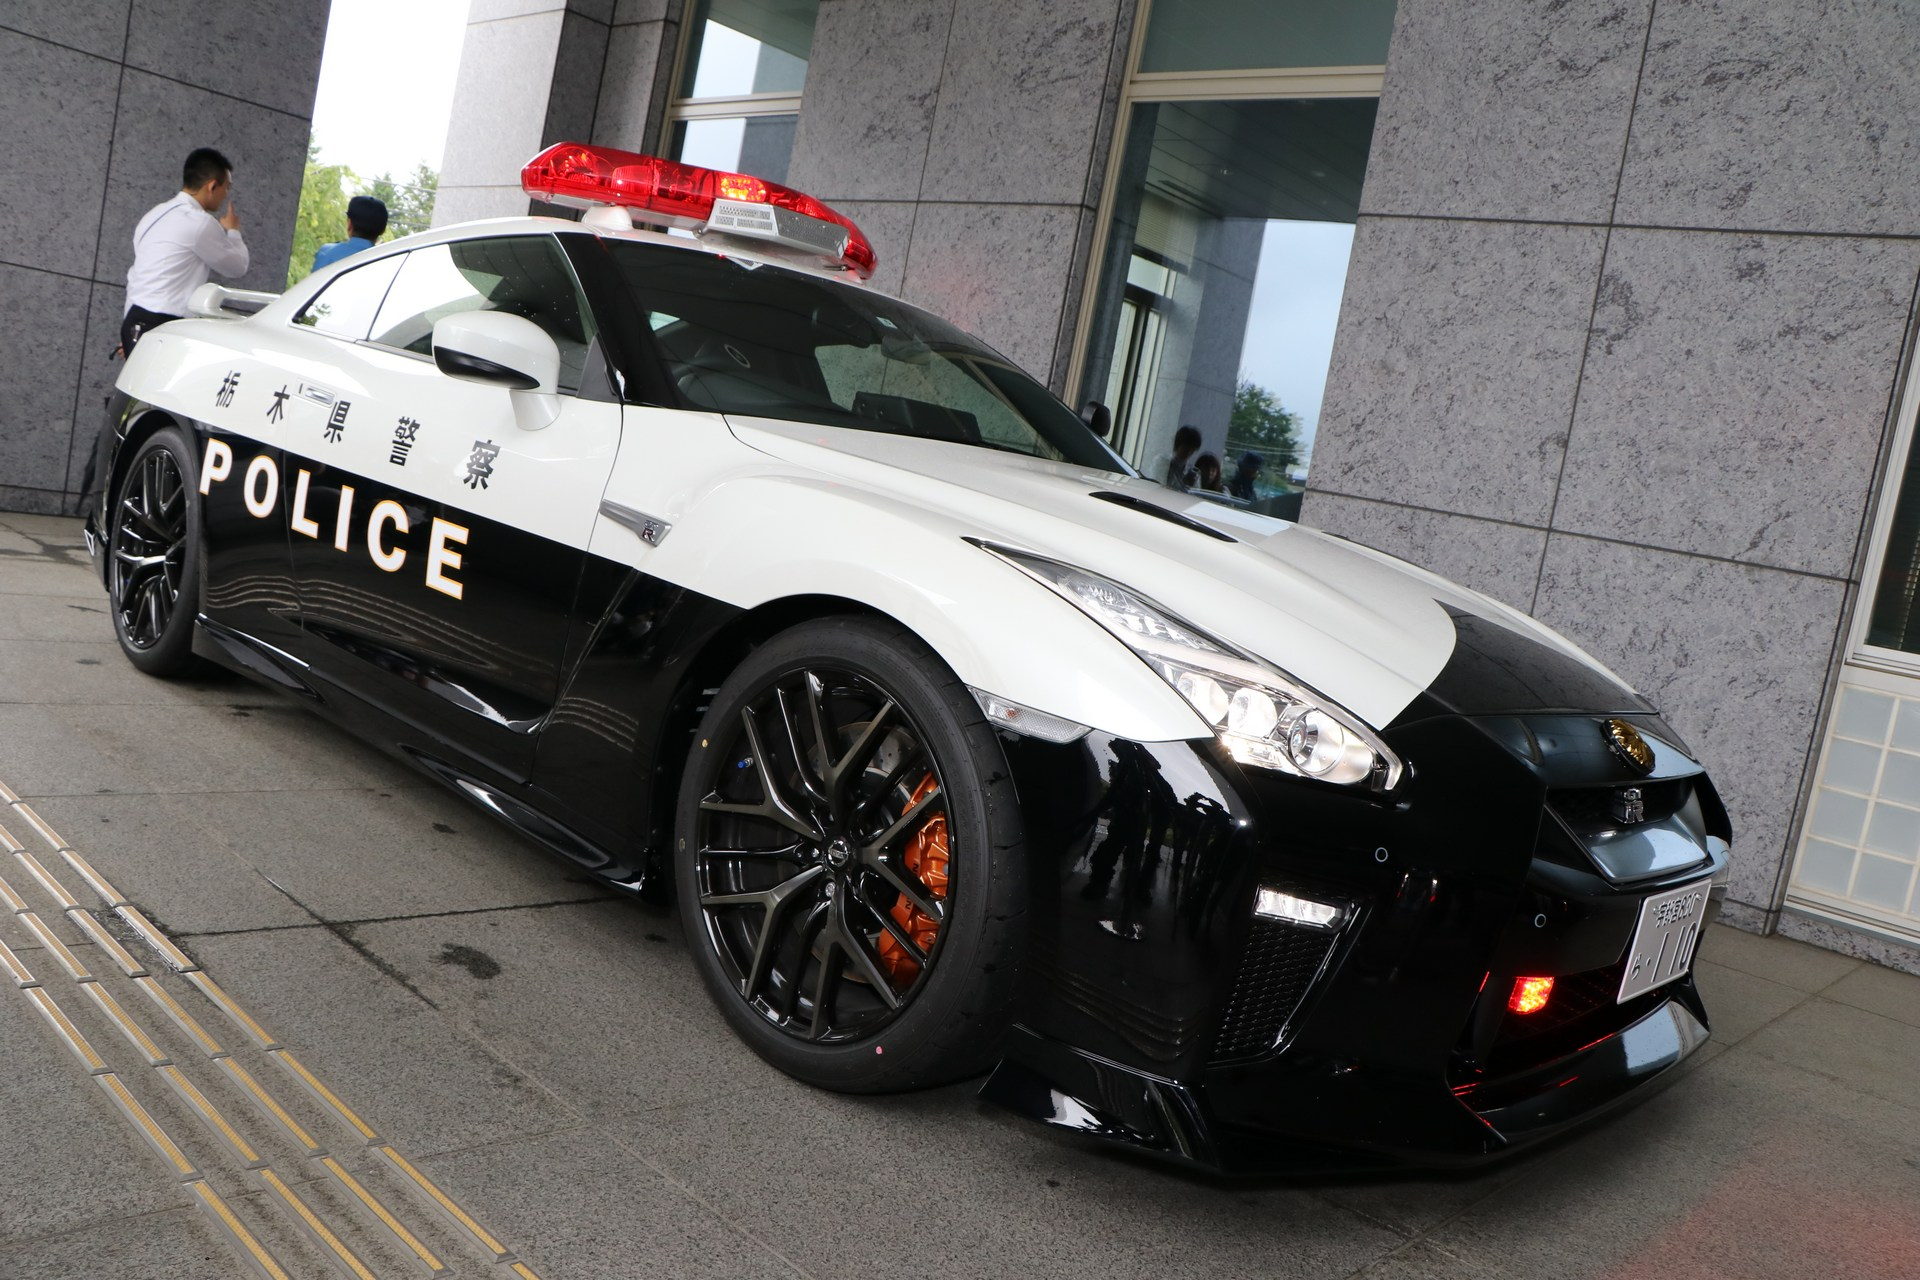 Nissan_GT-R_Police_Car_0006